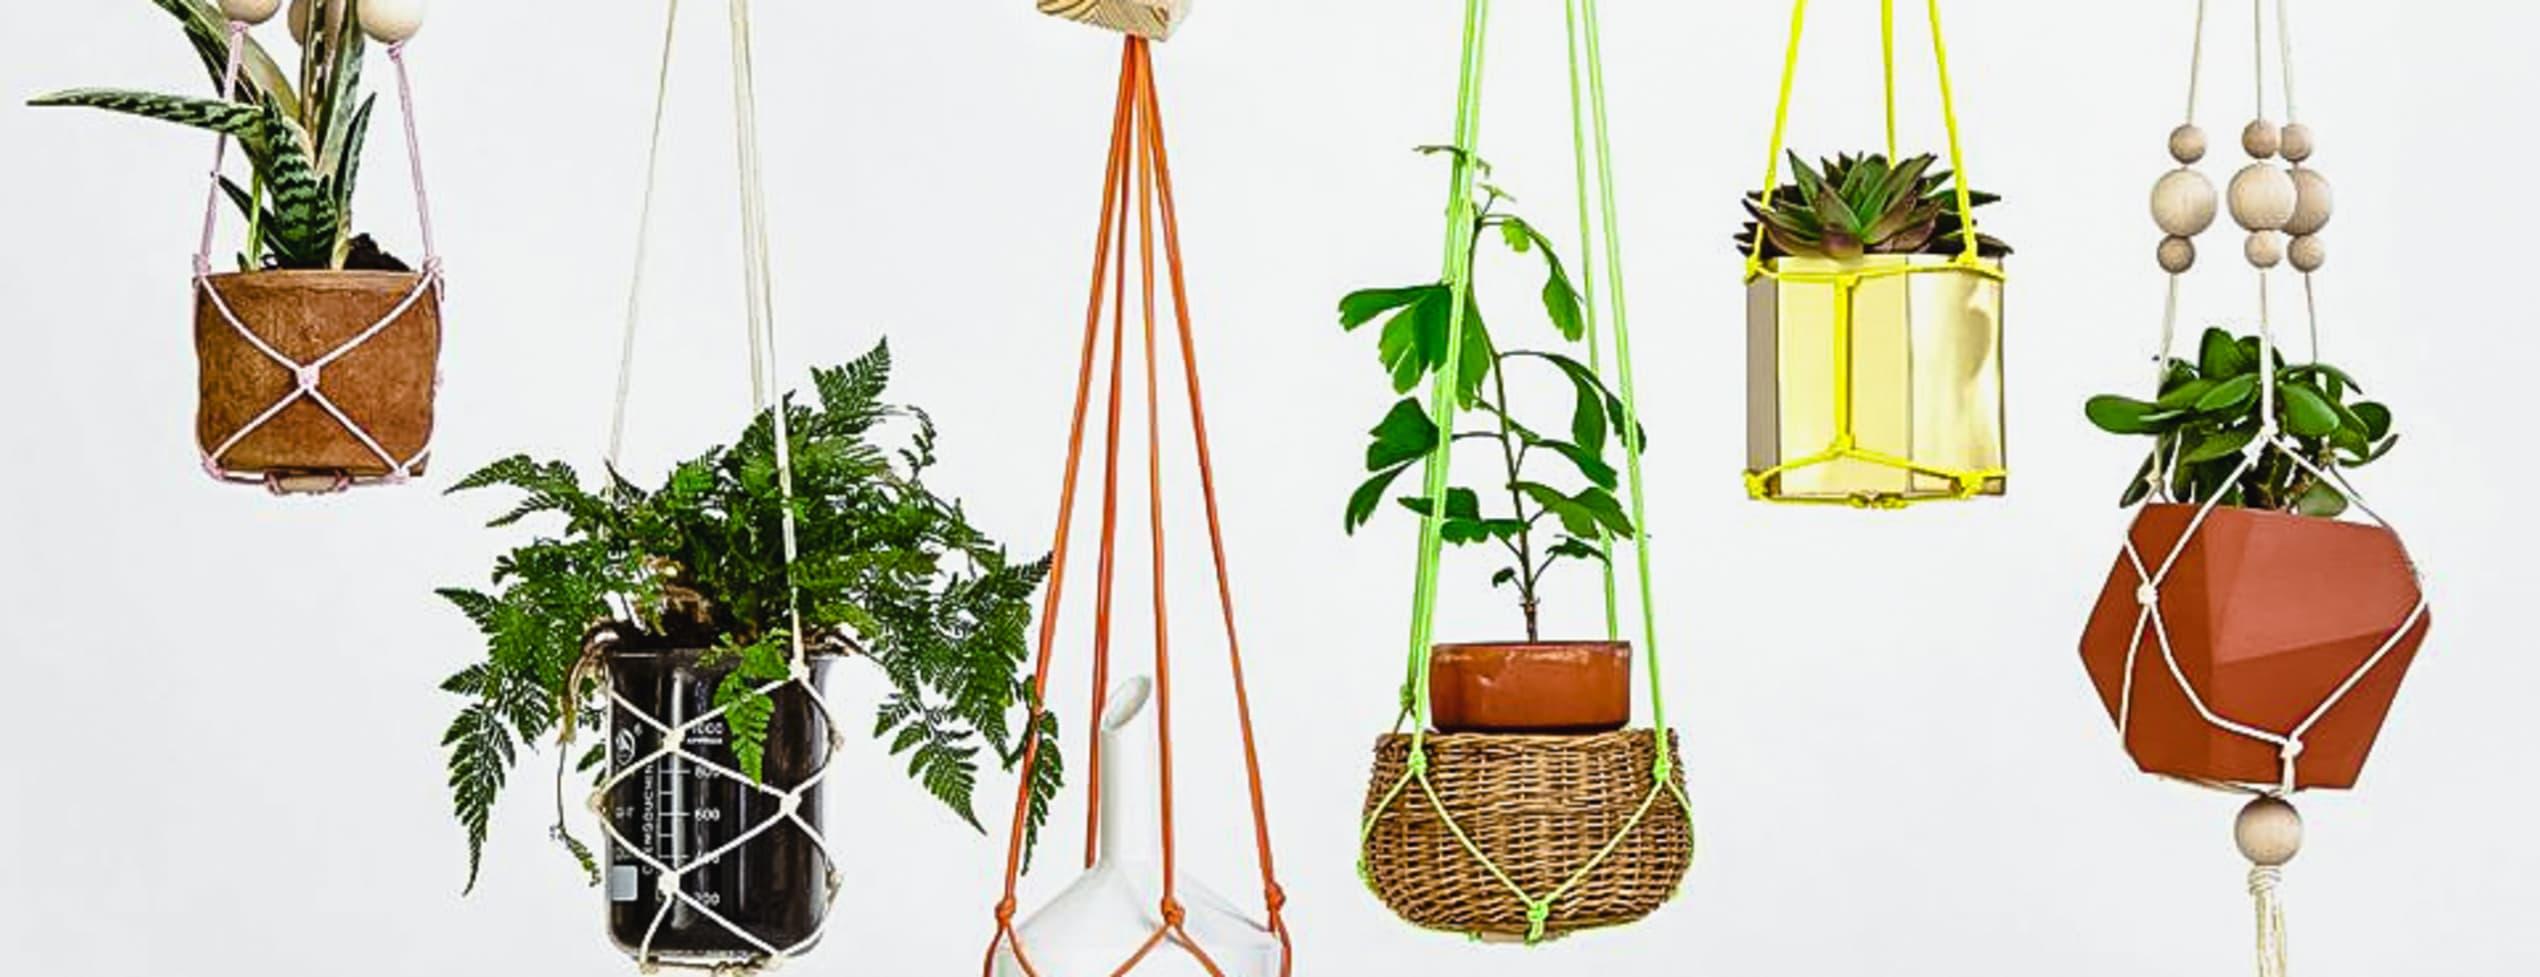 Macramé - Retro plant hangers